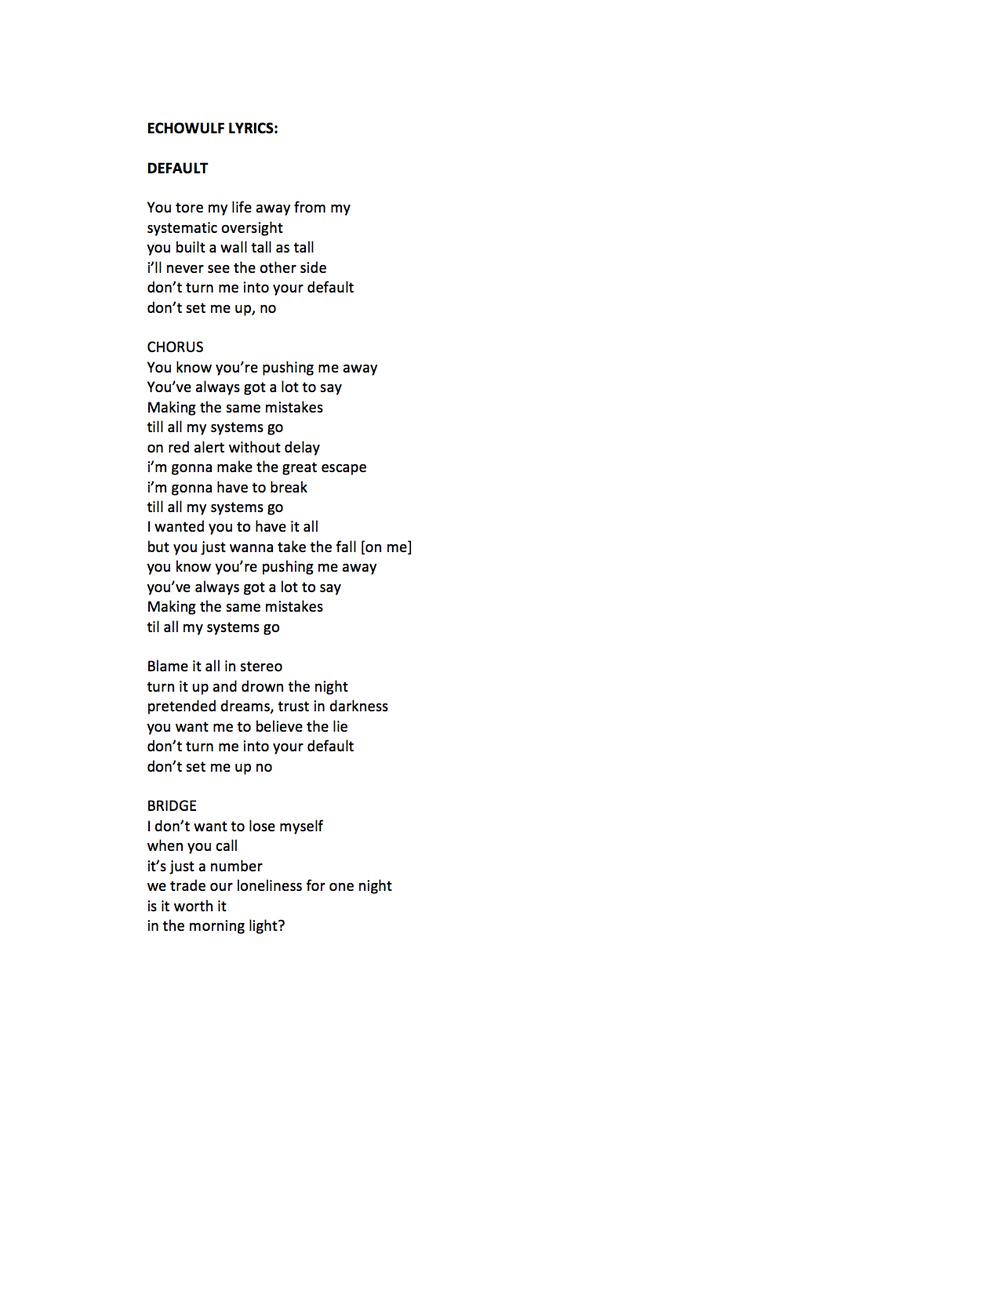 Default Lyrics.jpg